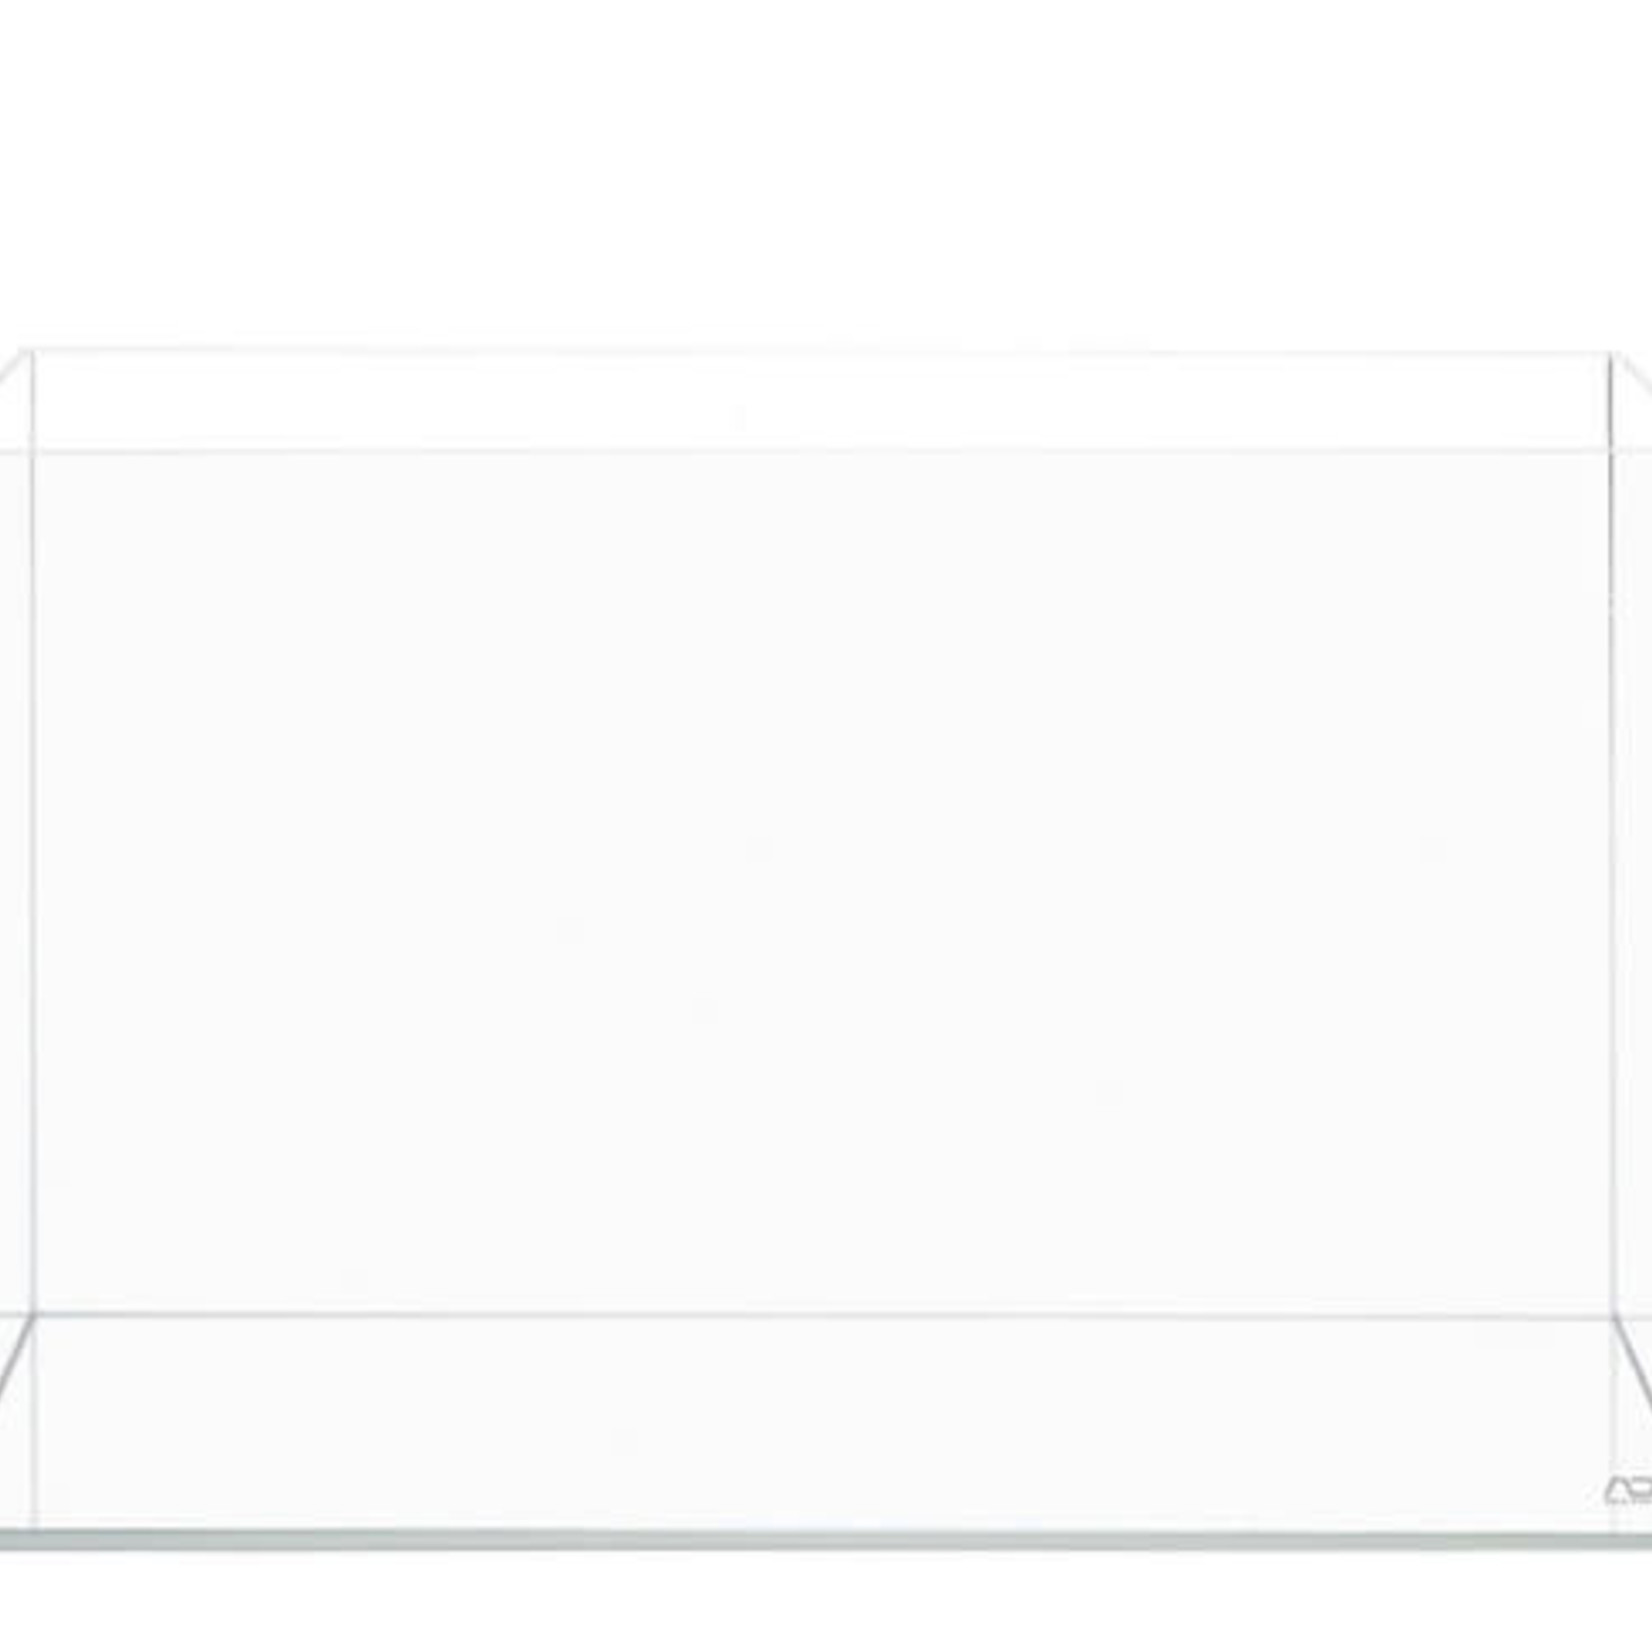 ADA Cube Garden 20-C (20x20x20/5mm)